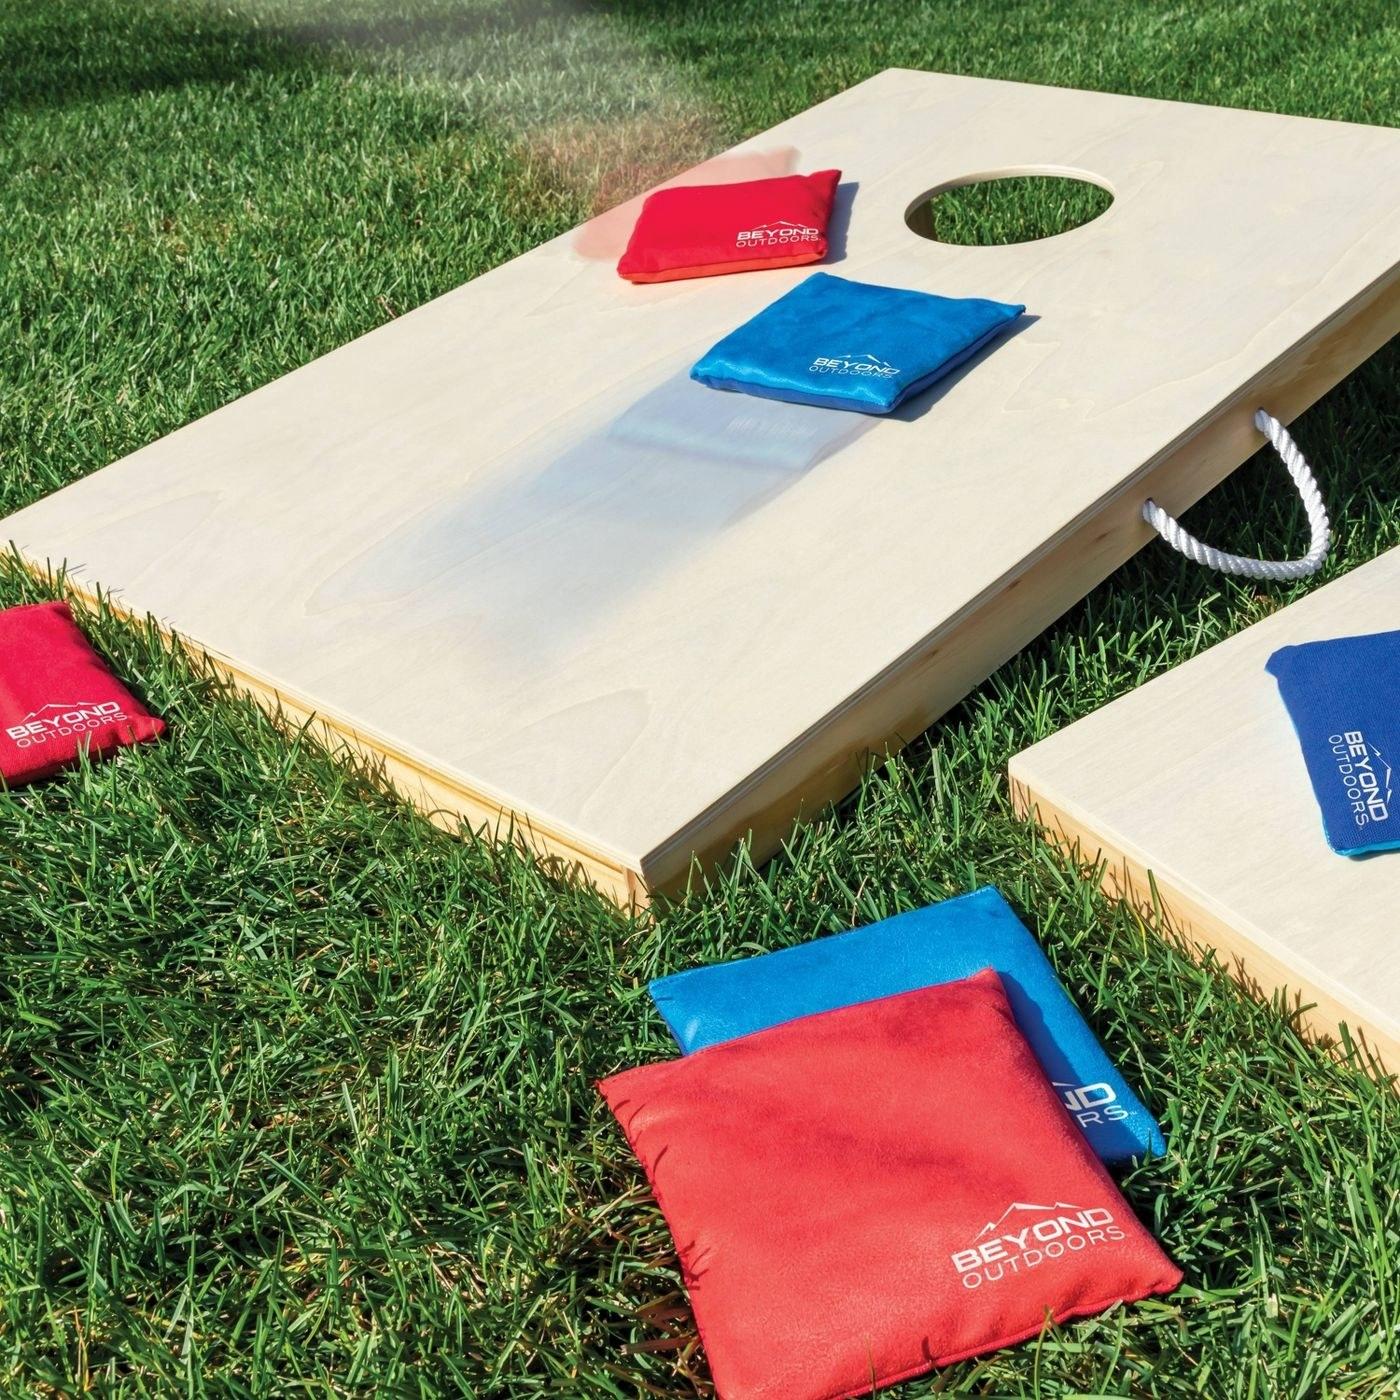 the bean bag toss set up outside on grass